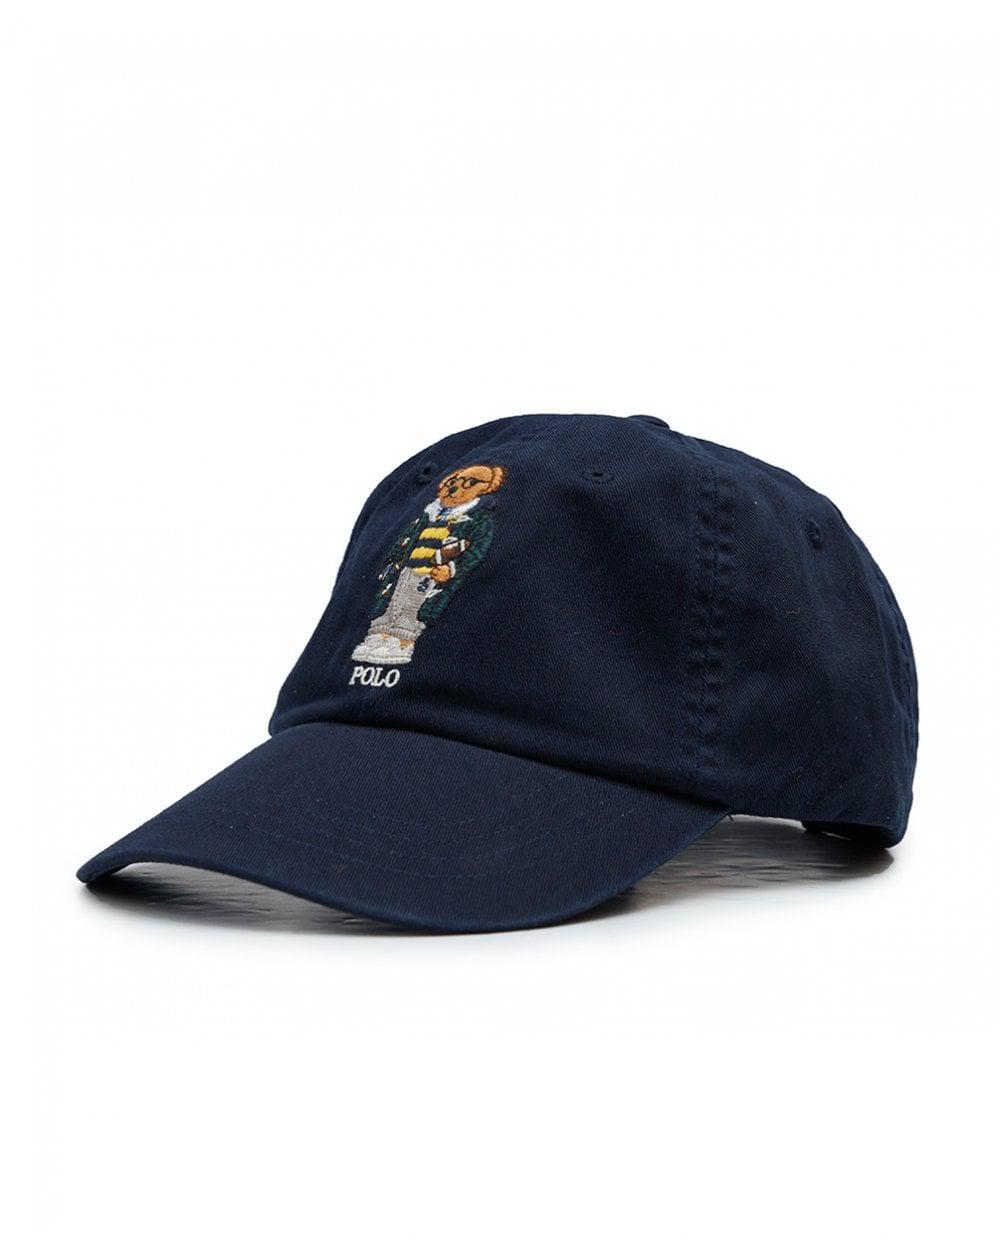 Polo Ralph Lauren Bear Cap in Blue for Men - Lyst 740530155cbf